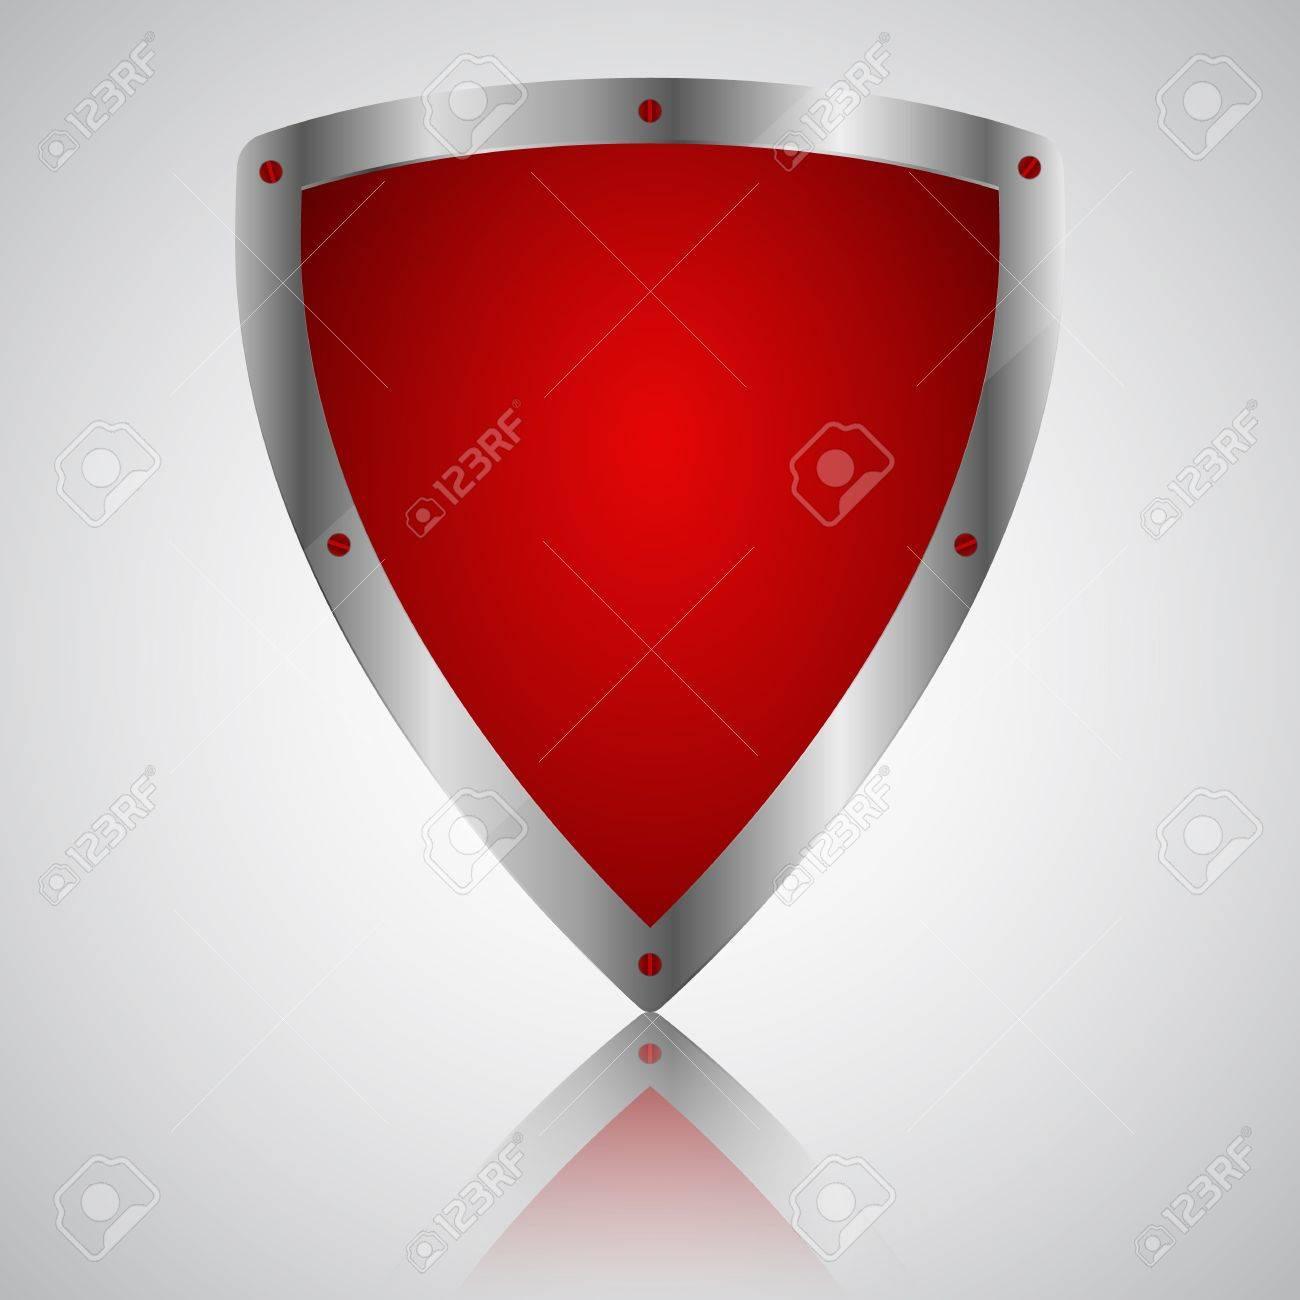 Victory red shield symbol icon, illustration Standard-Bild - 20087696